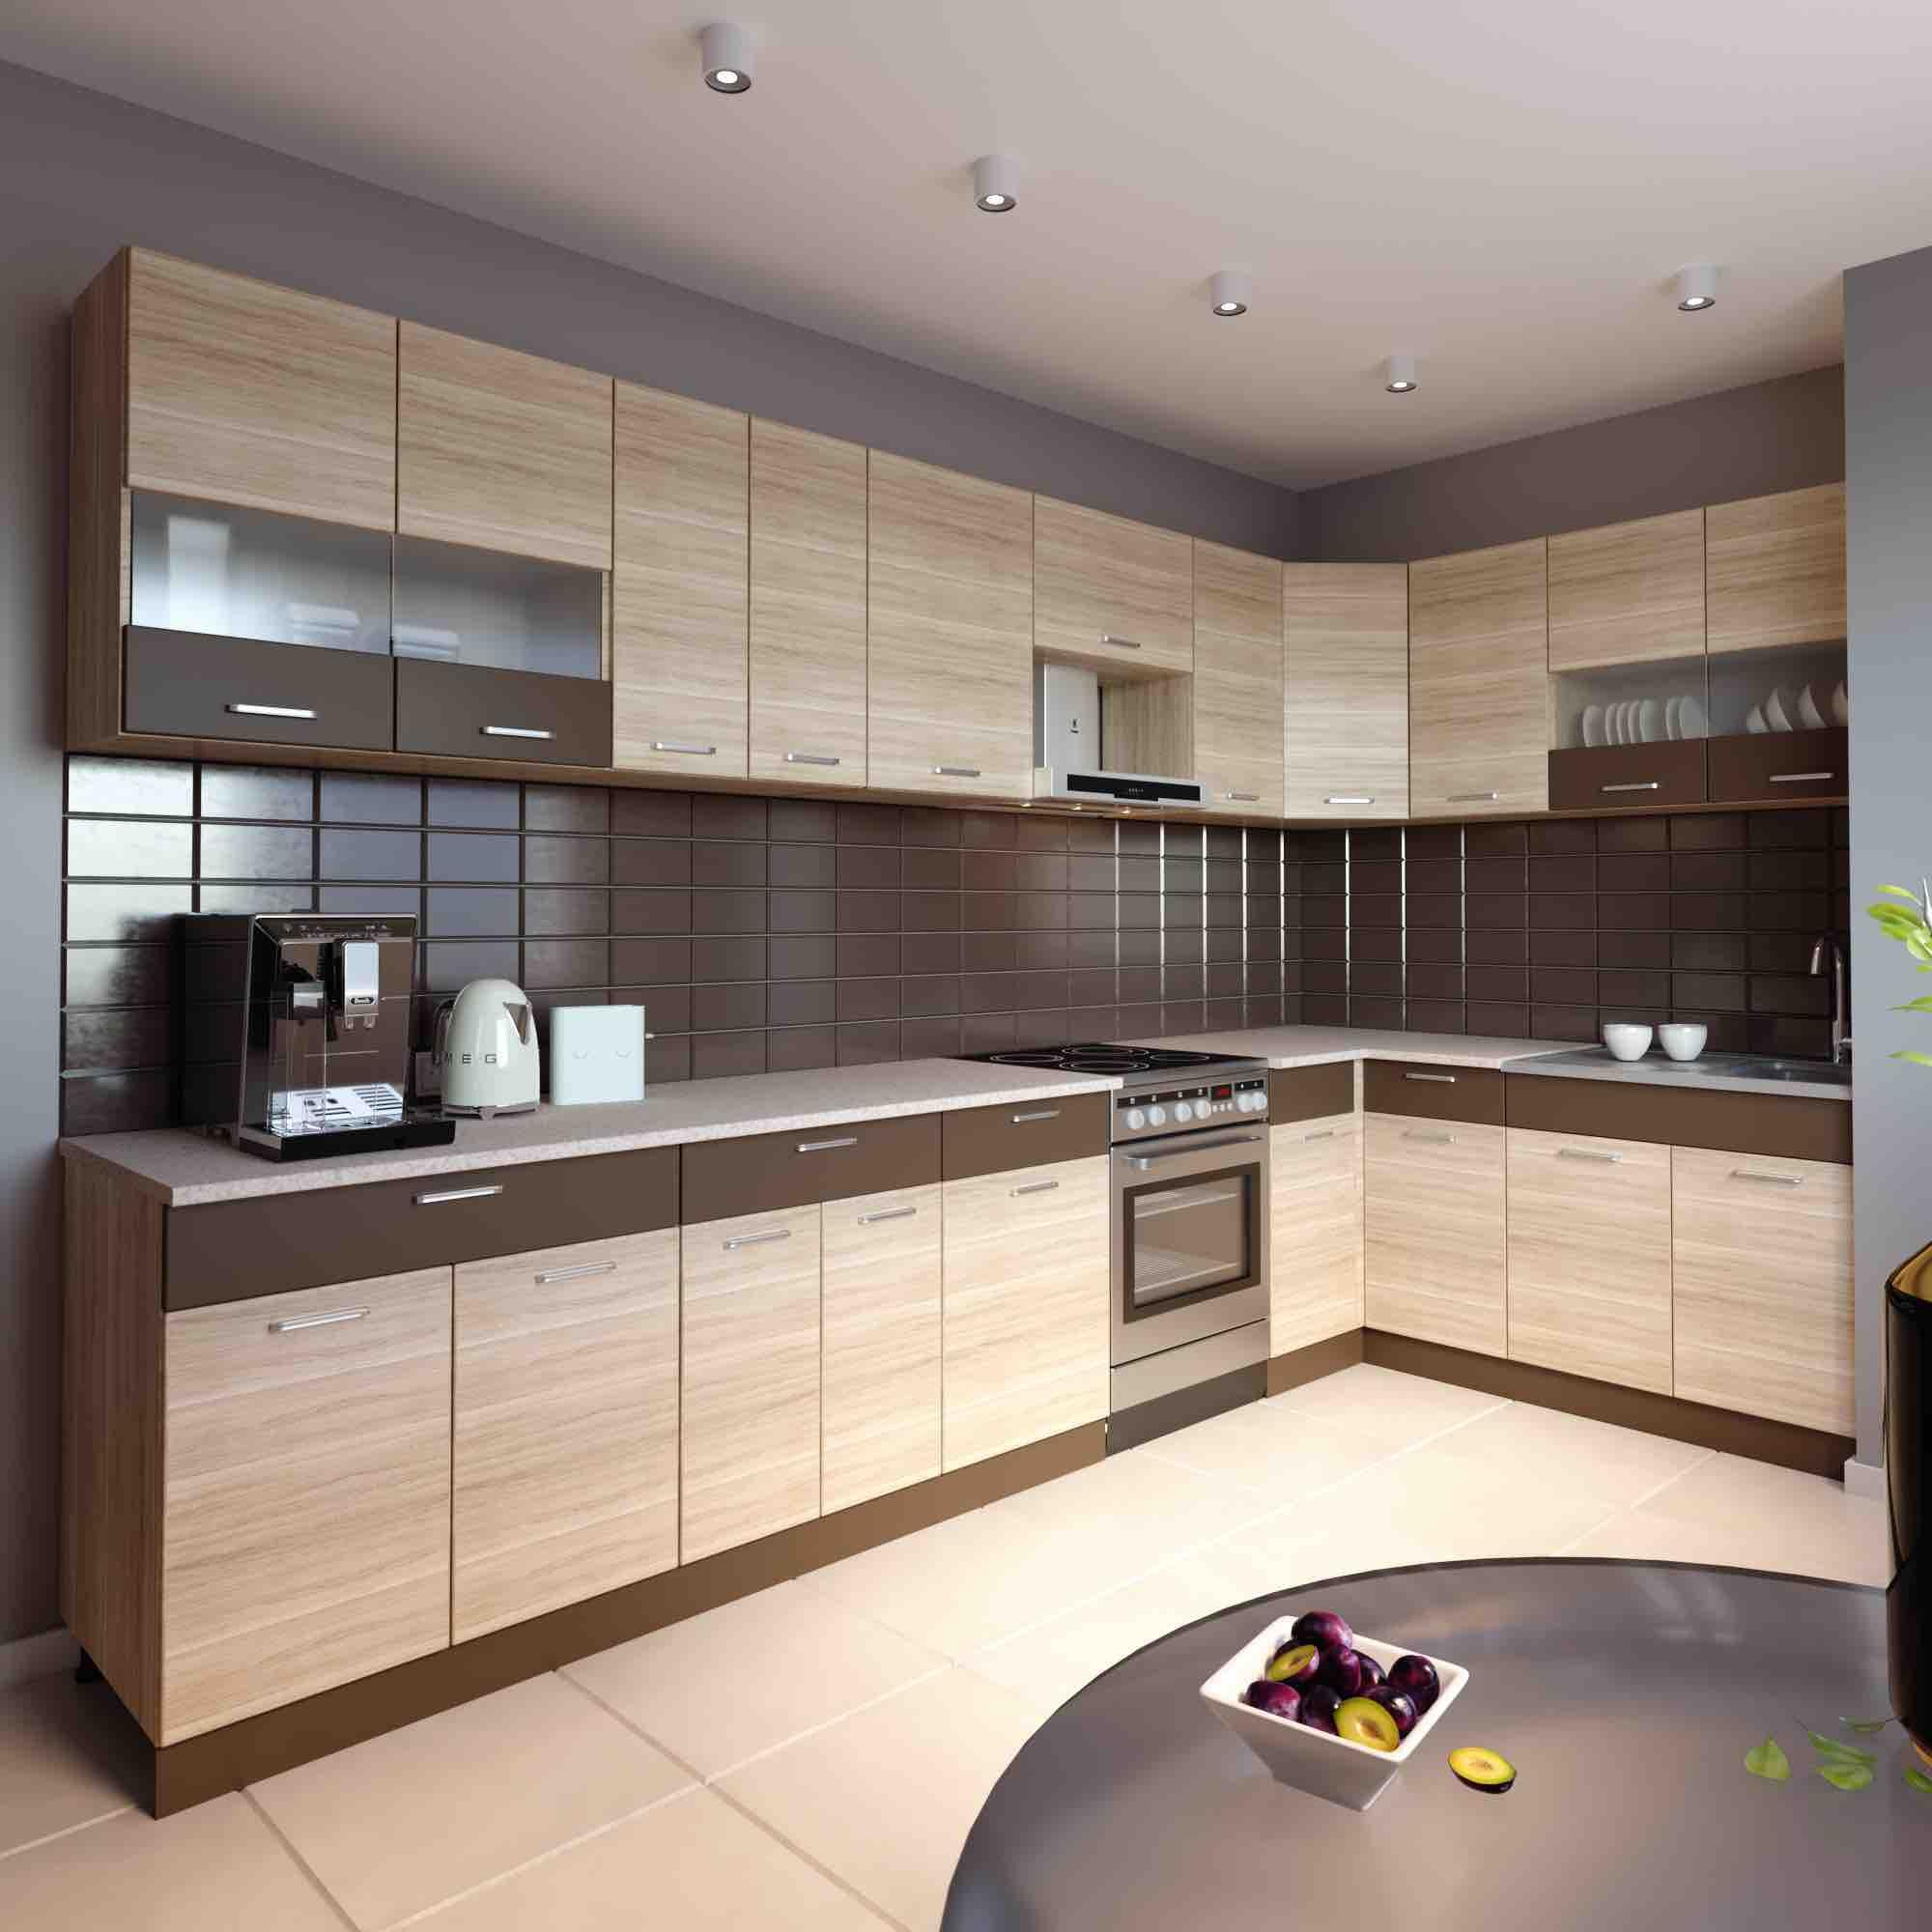 Full Size of Küche L Form Grundriss Günstige Küche L Form Küche L Form Ikea Küche L Form Mit Kochinsel Küche Küche L Form